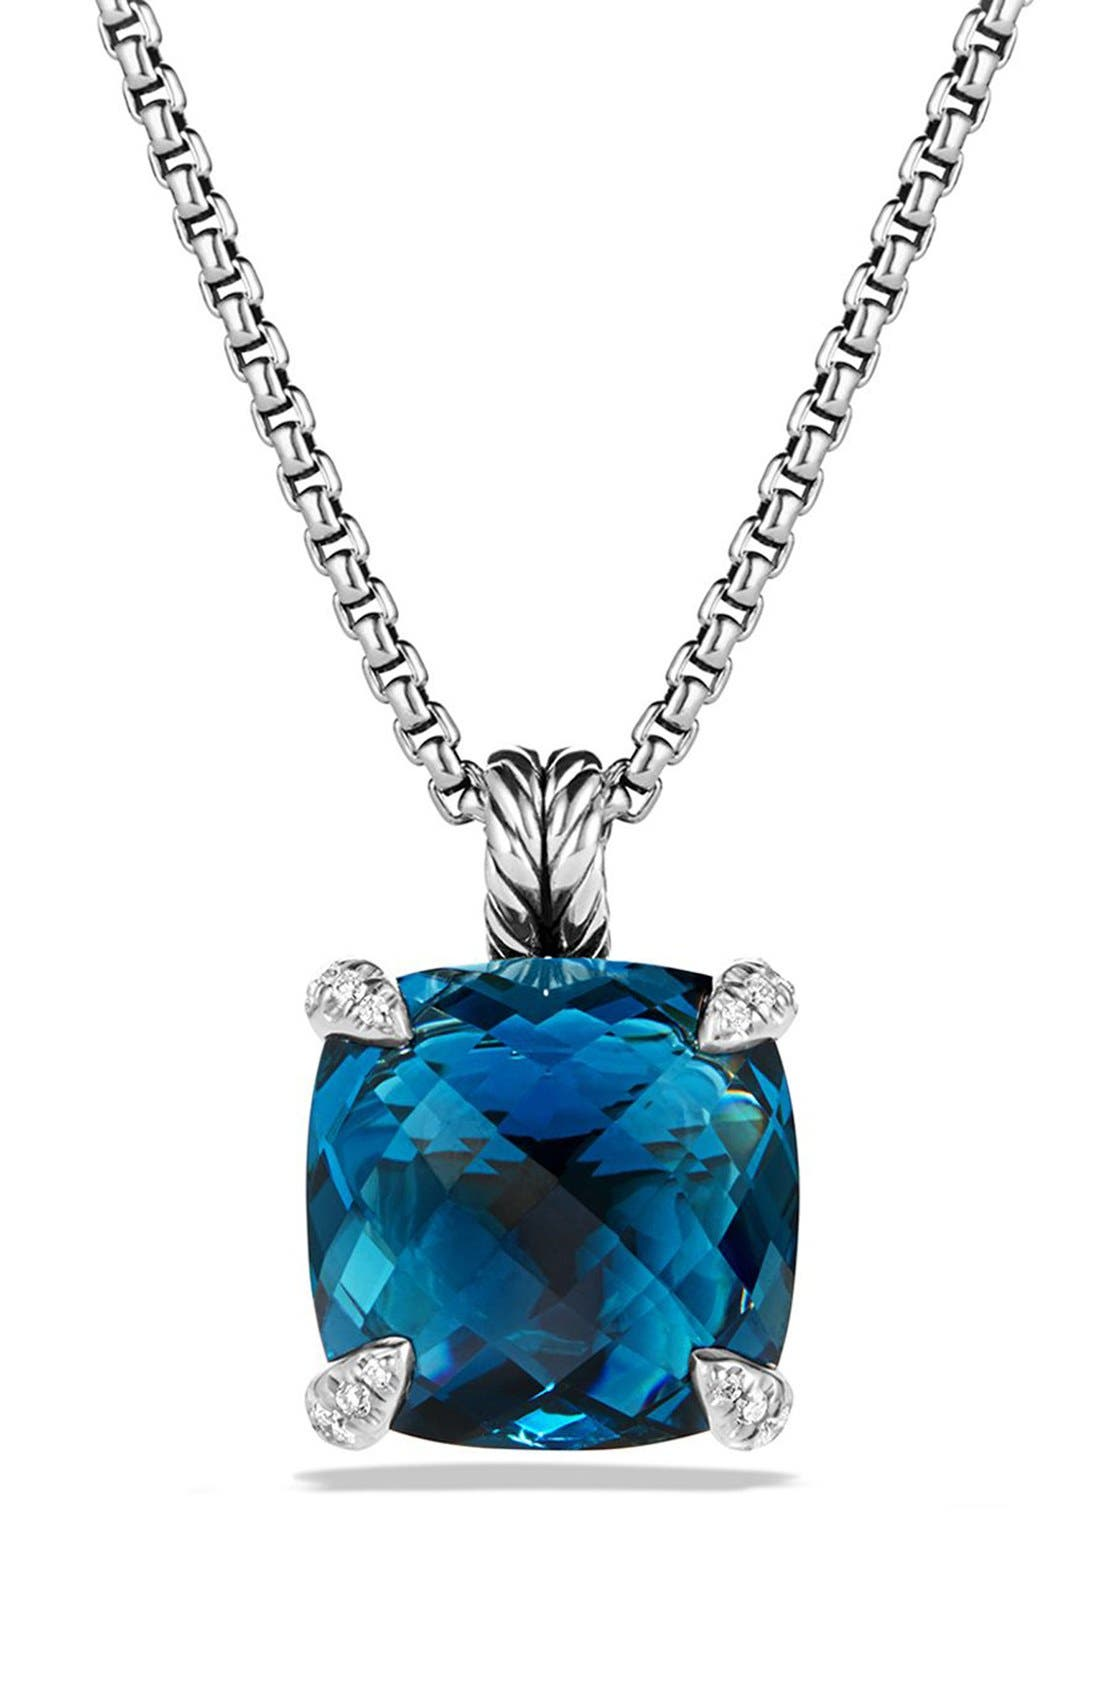 'Châtelaine' Pendant Necklace with Semiprecious Stone and Diamonds,                             Main thumbnail 1, color,                             Silver/ Hampton Blue Topaz